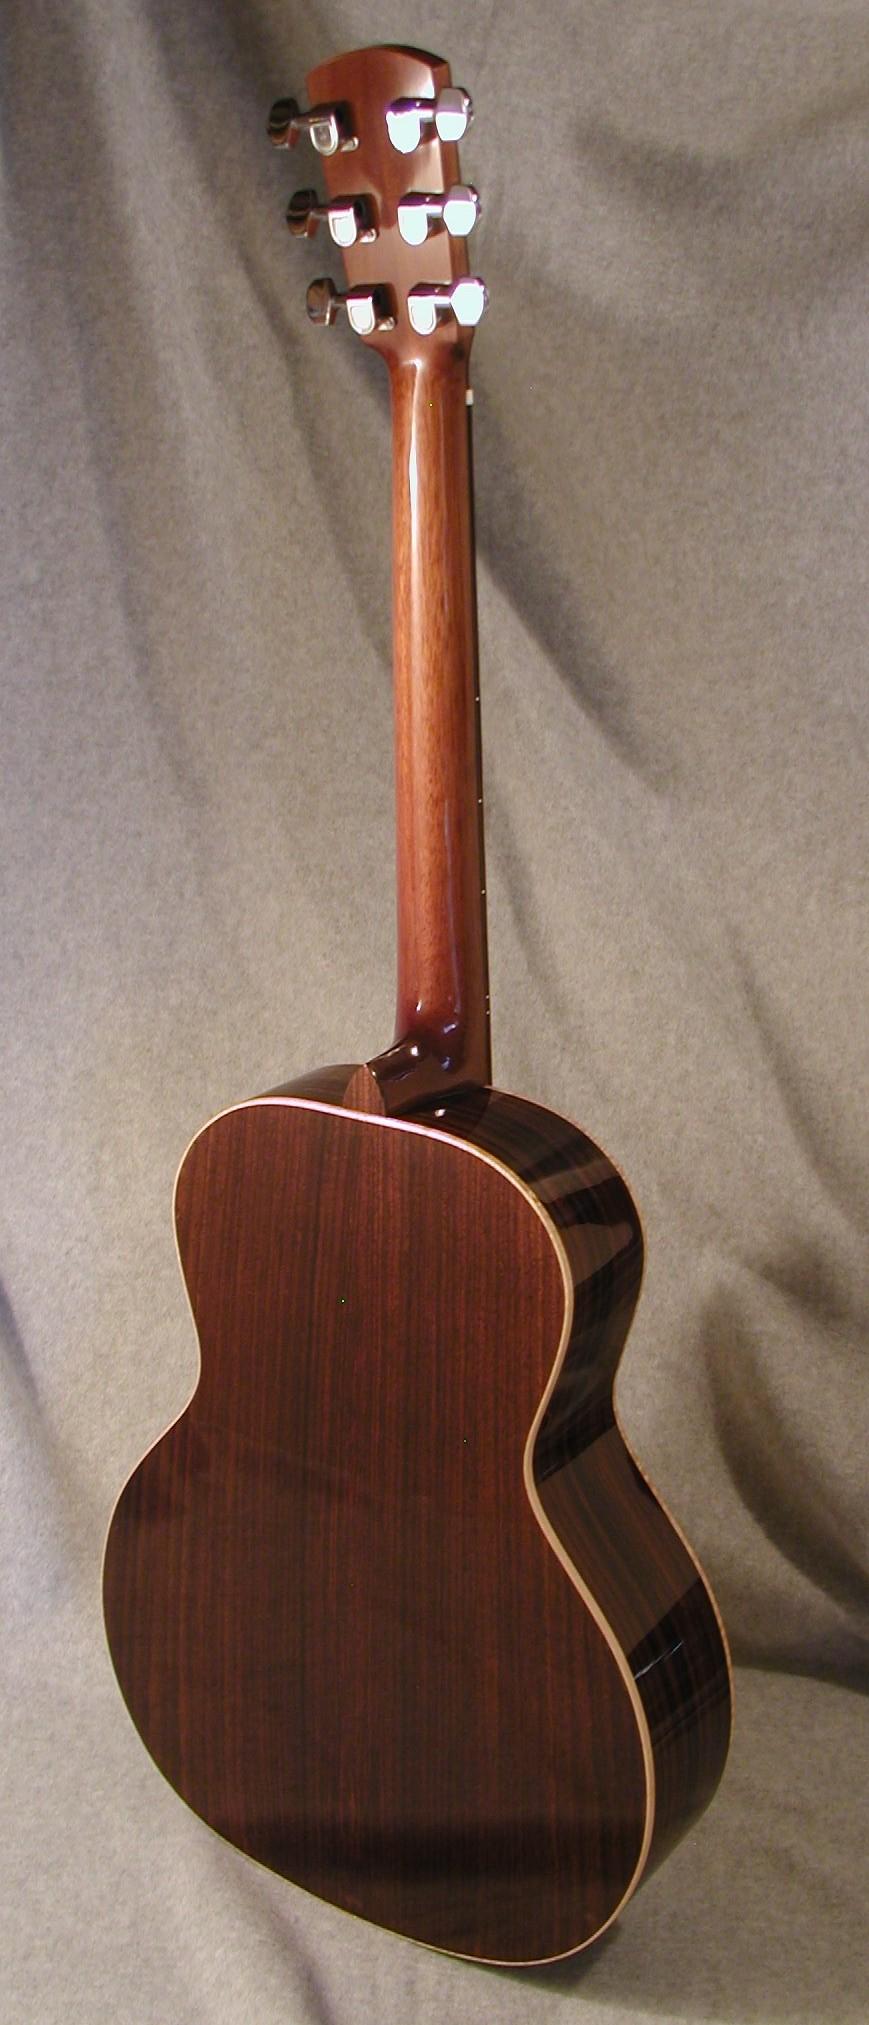 SerenadeB08-Crop-Guitar-Luthier-LuthierDB-Image-3